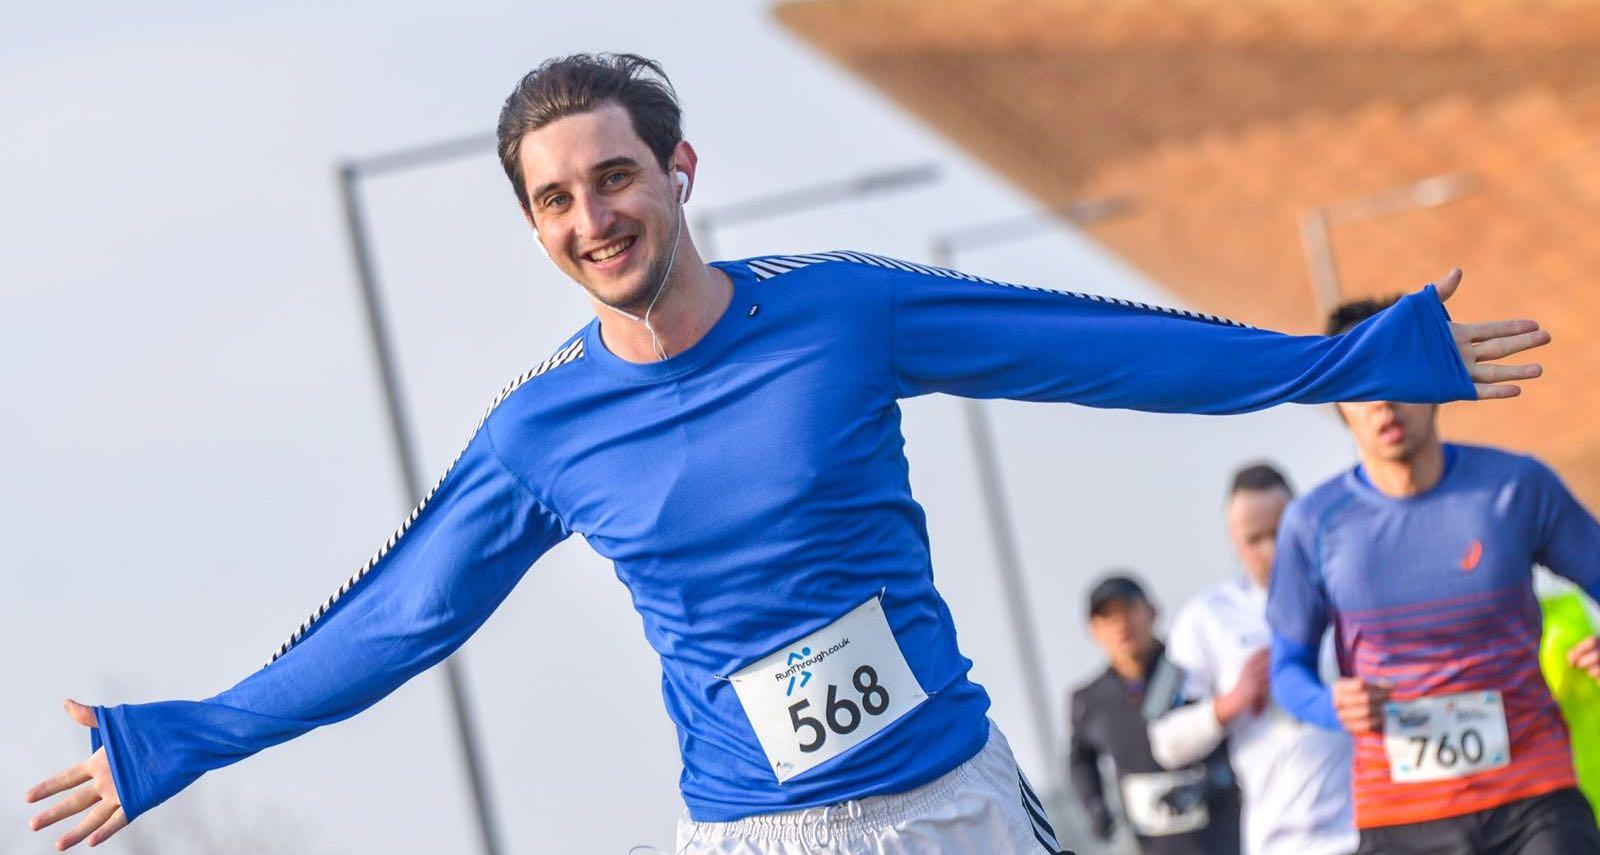 Run Aintree 5k, 10k & Half Marathon - October 2022